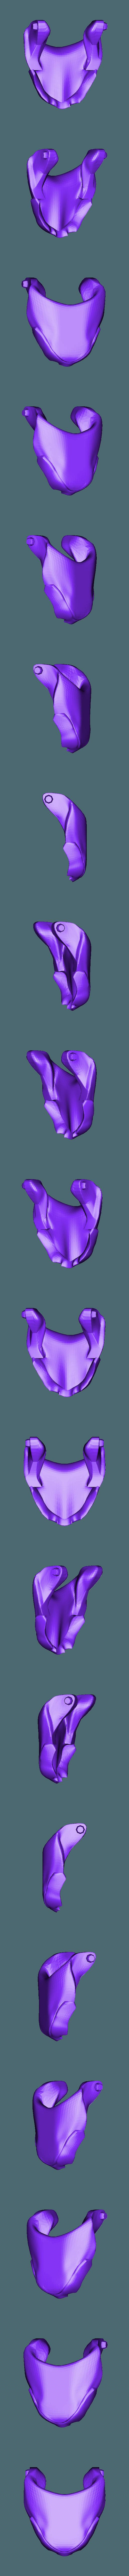 dunk_jaw.stl Download free STL file Flexi 3D Fish • 3D printer model, 25caih